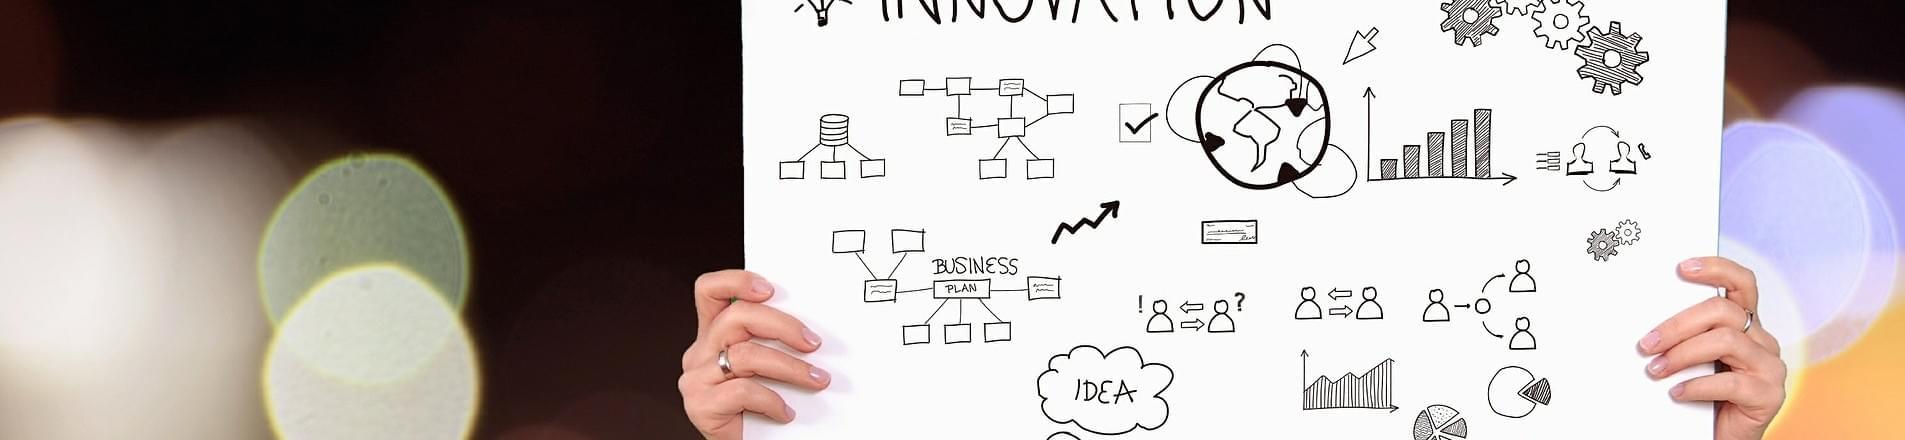 Director Corporate Responsibility | Senior Business Roles